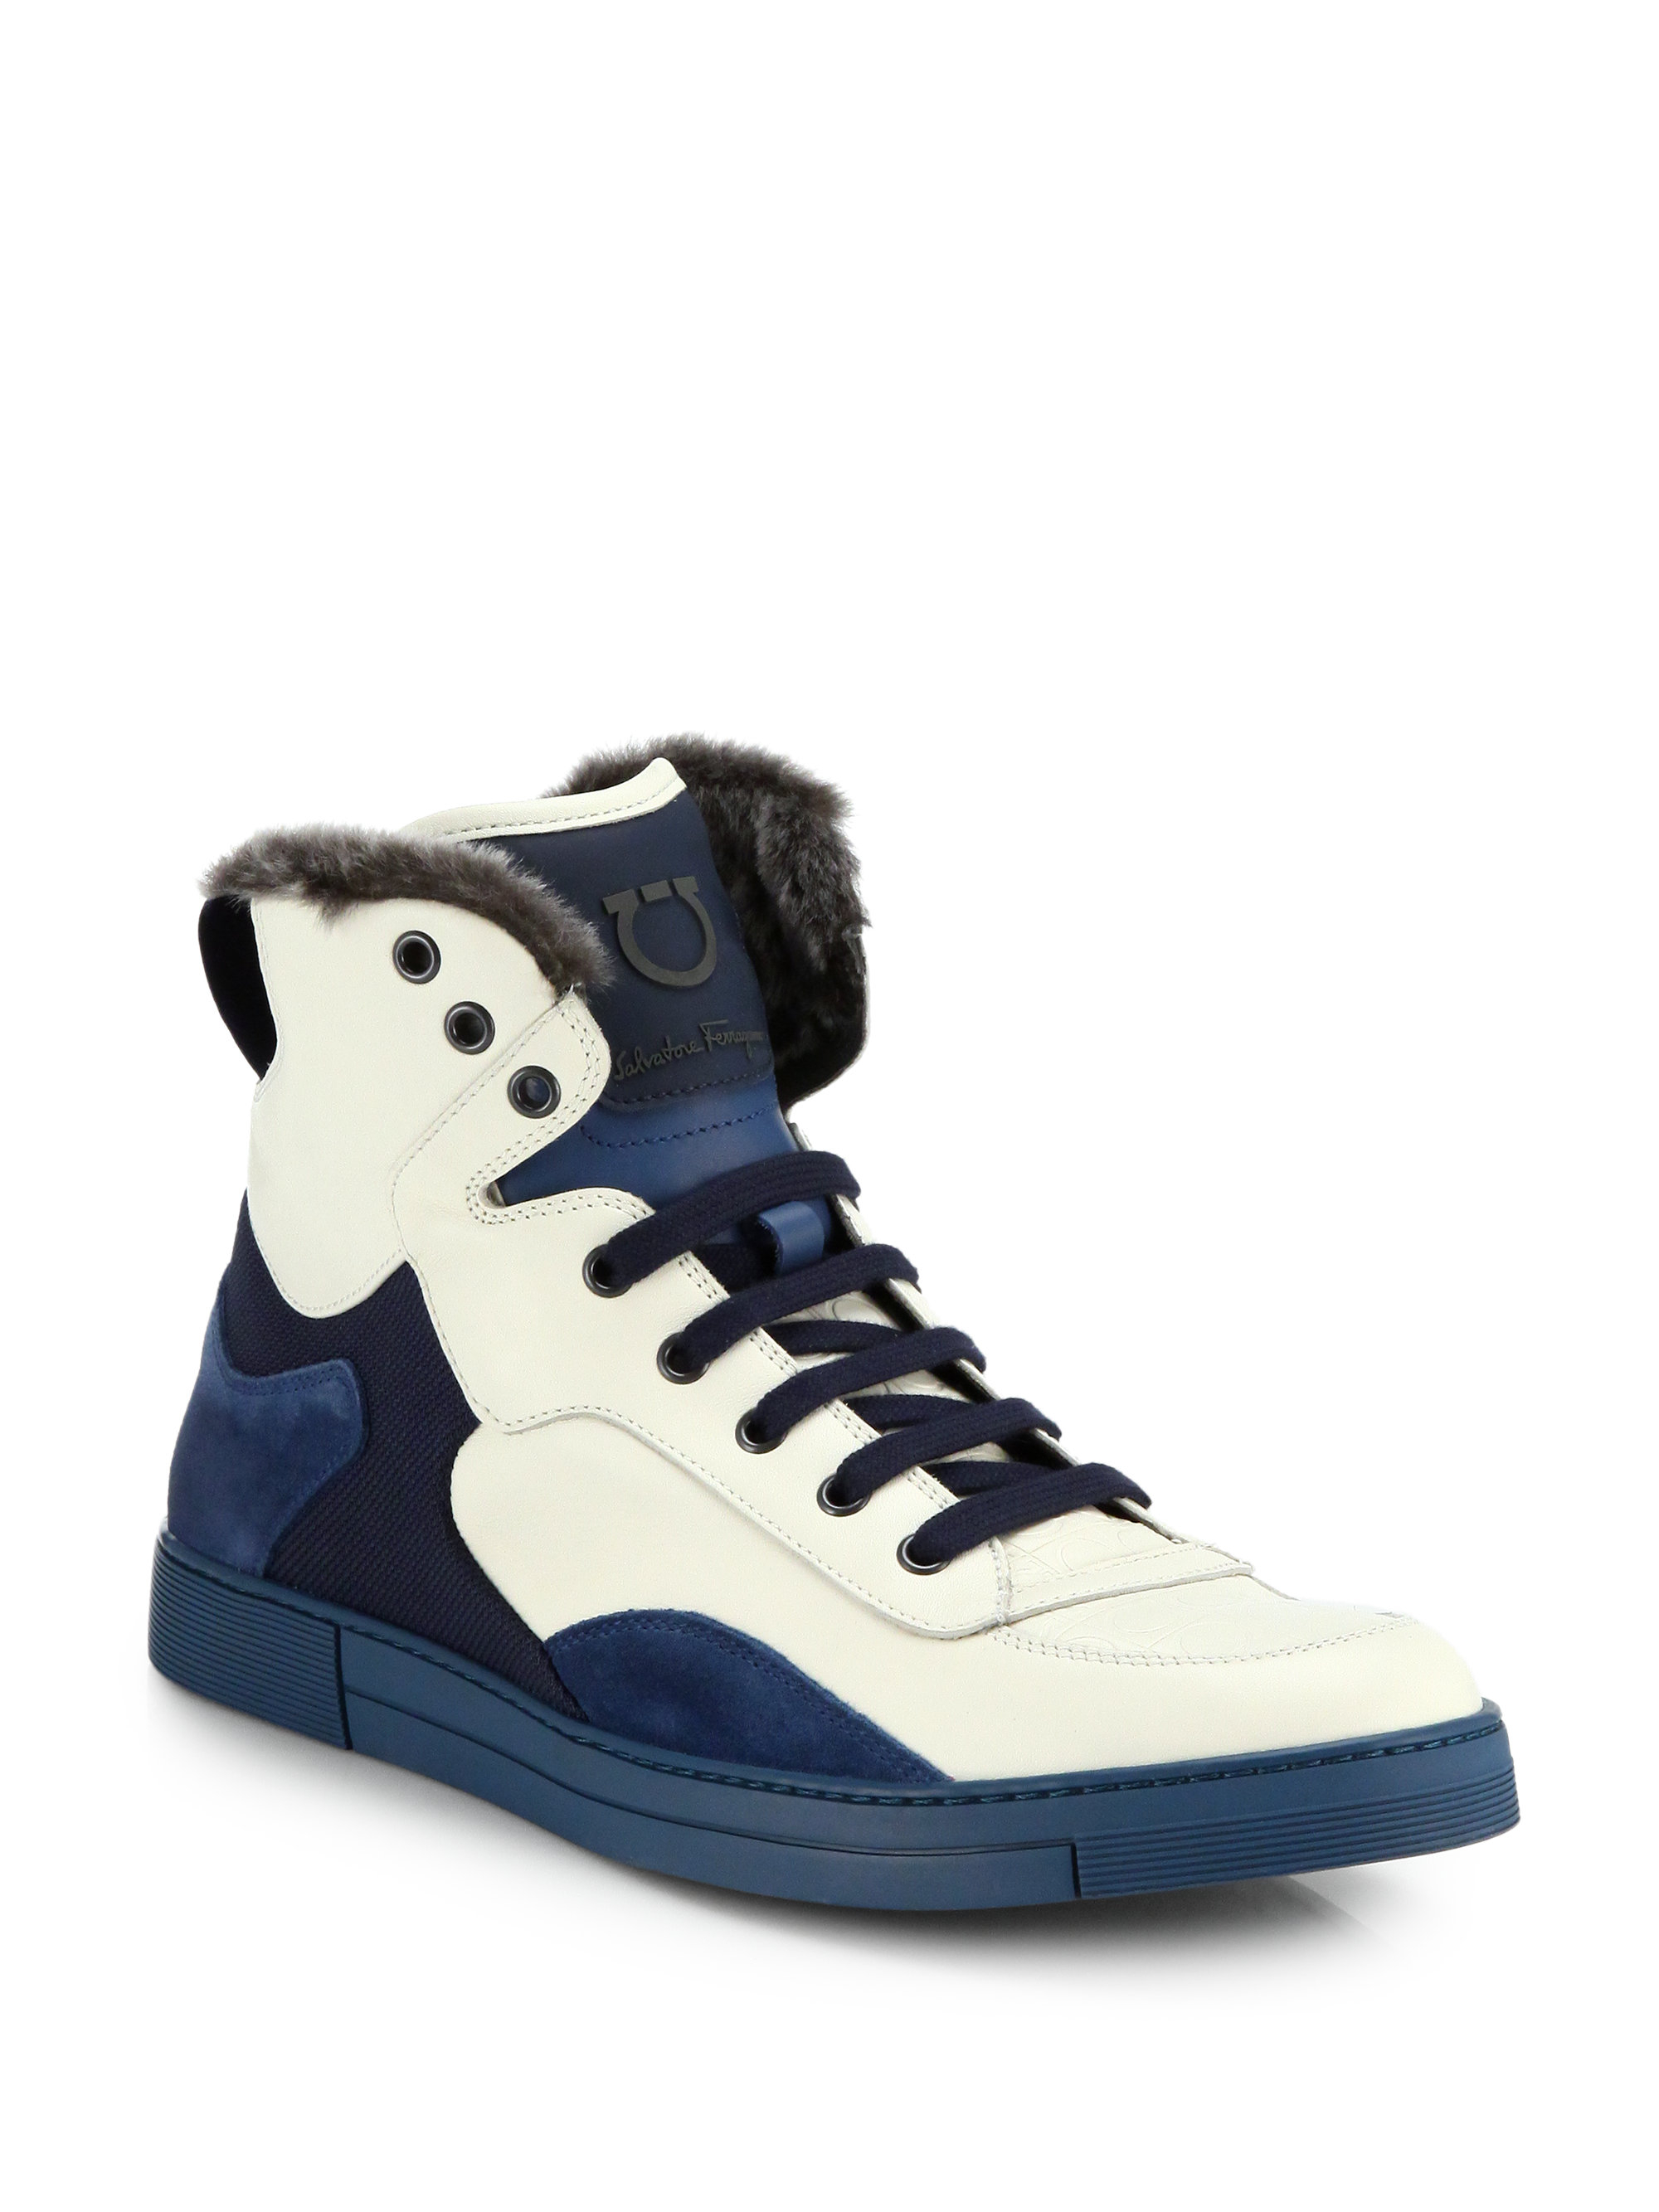 Ferragamo Sizing Mens Shoes